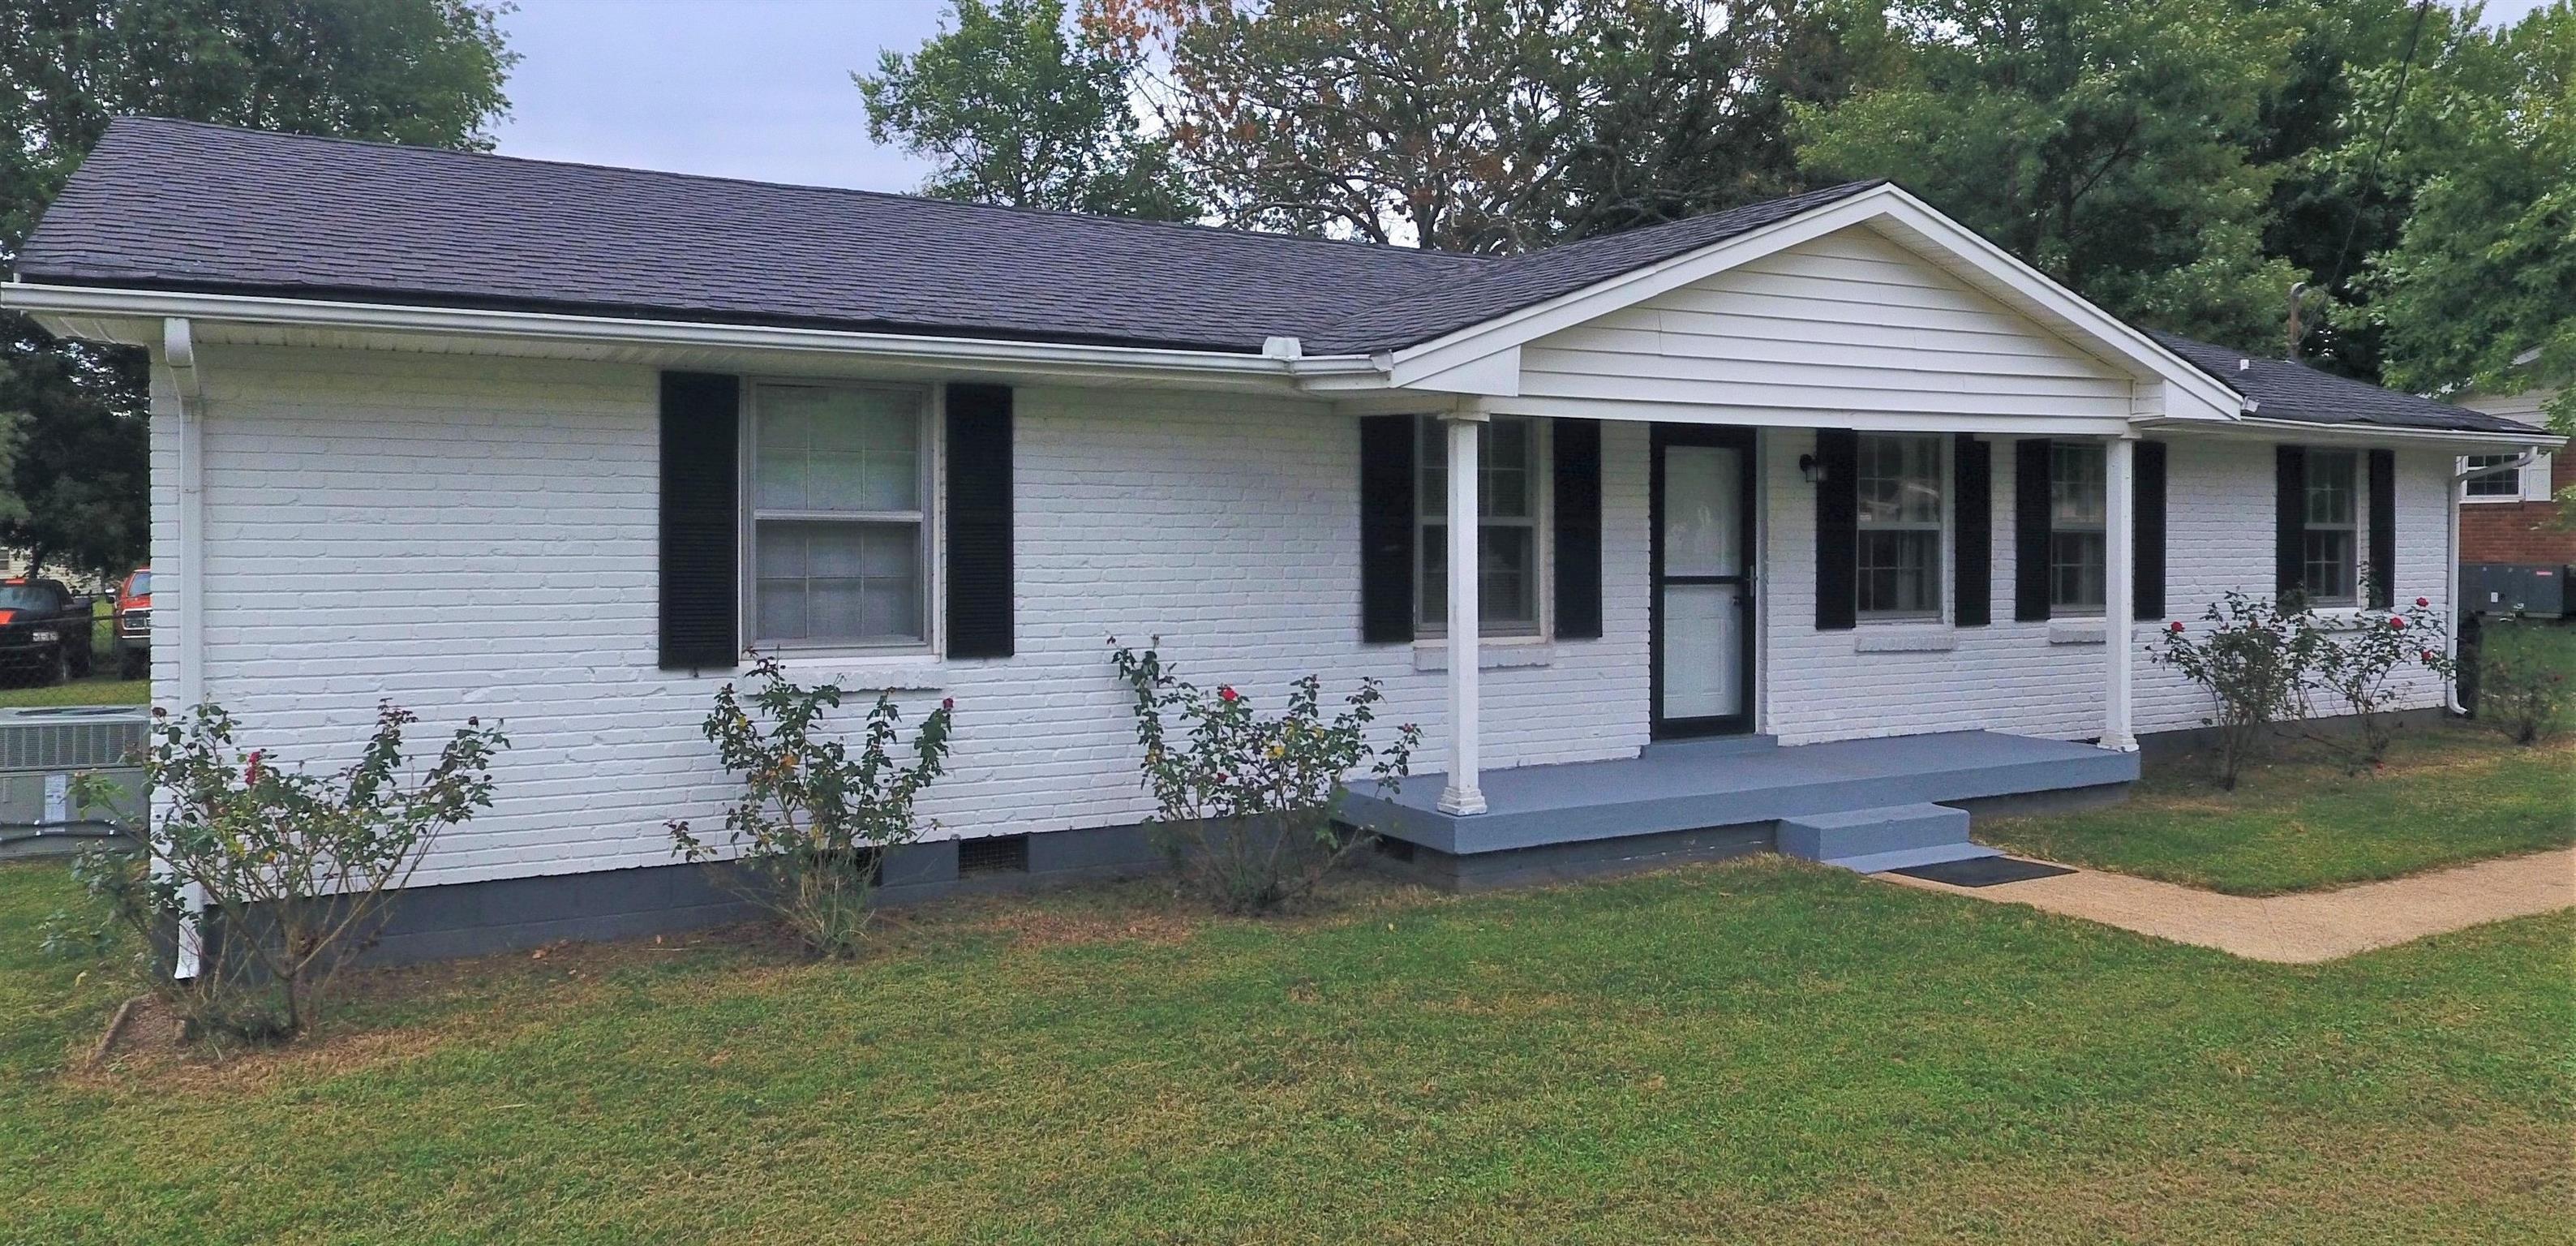 206 Elnora Dr, Hendersonville, TN 37075